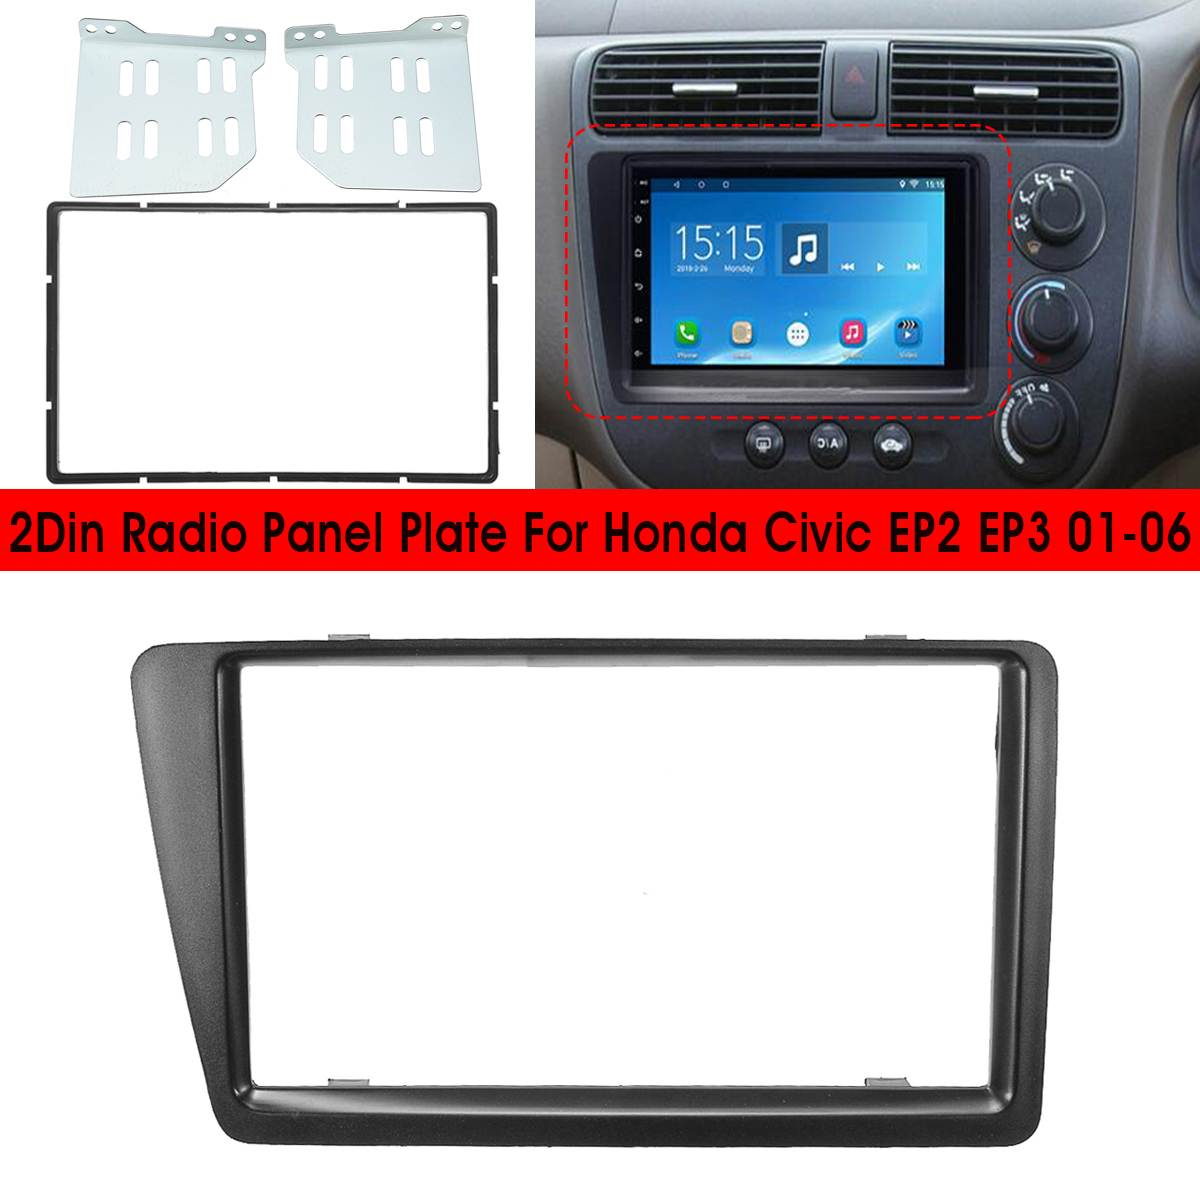 RHD 2 Din Car Radio Fascia PVC Marco de panel CD DVD Dash de Audio recorte cubierta para Honda cívica EP2 EP3 2001, 2002, 2003, 2004, 2005